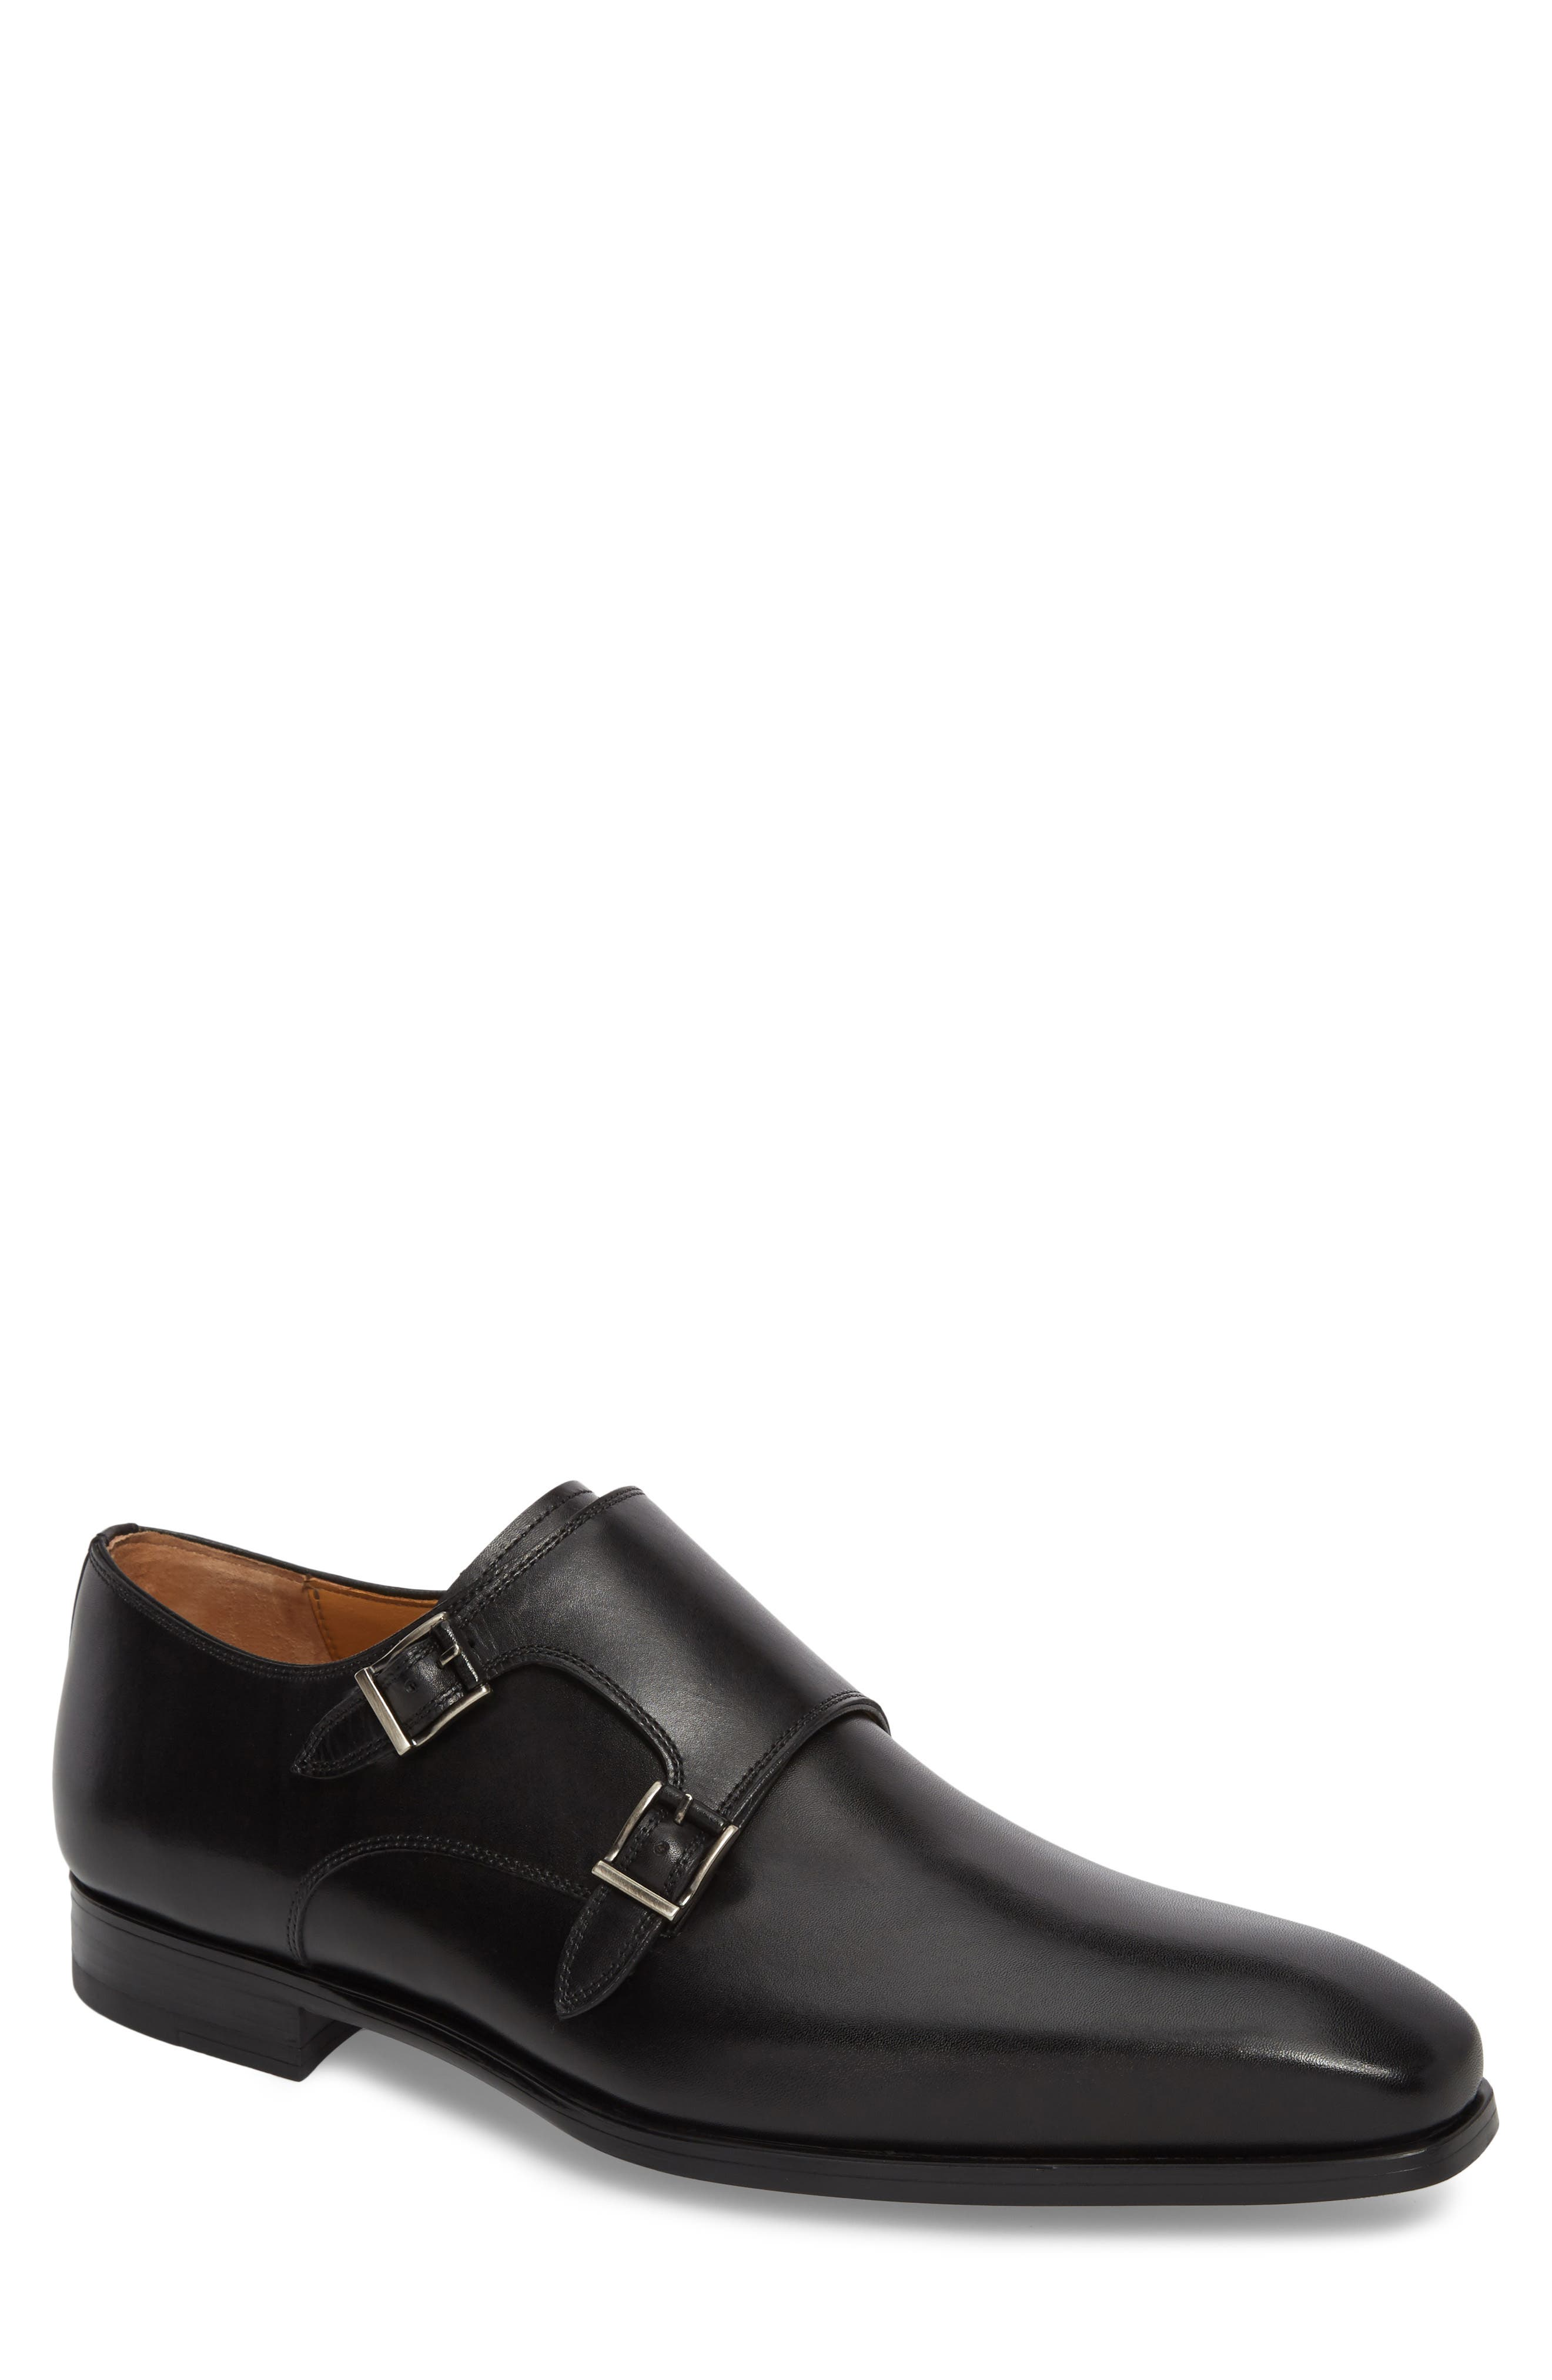 Ramolo Double Monk Strap Shoe,                             Main thumbnail 1, color,                             Black Leather